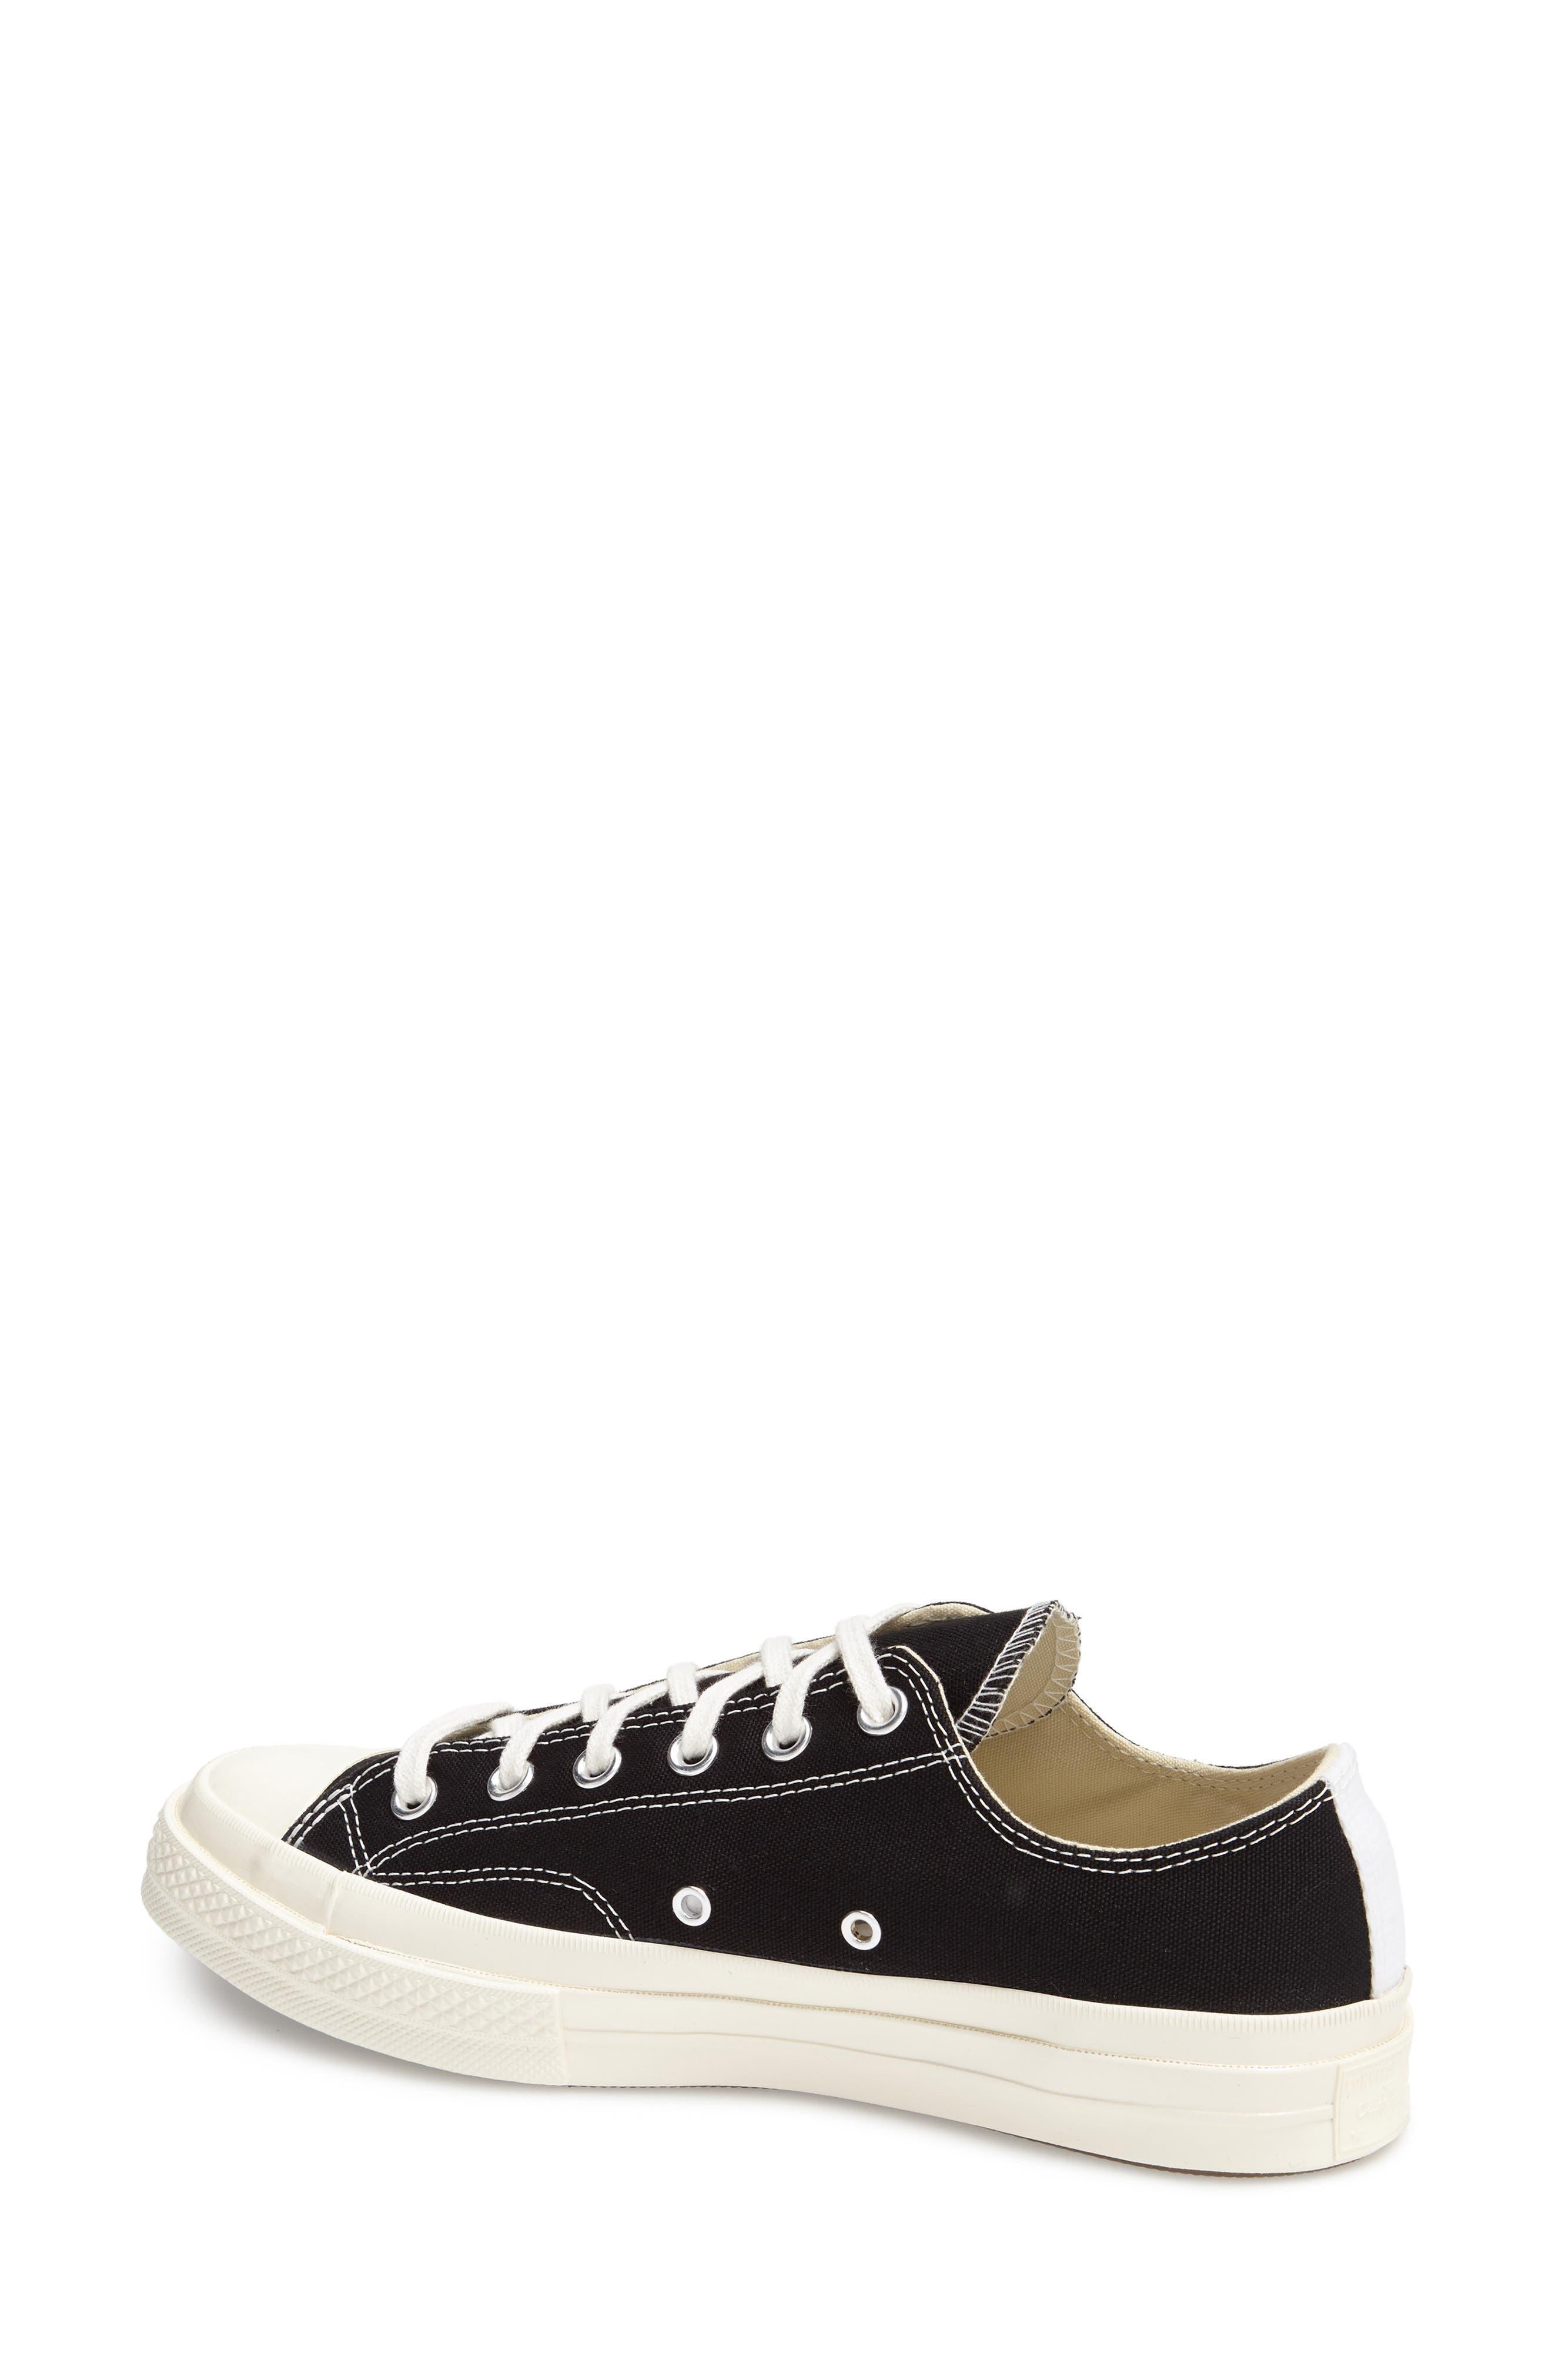 x Converse Chuck Taylor<sup>®</sup> Hidden Heart Low Top Sneaker, Main, color, BLACK